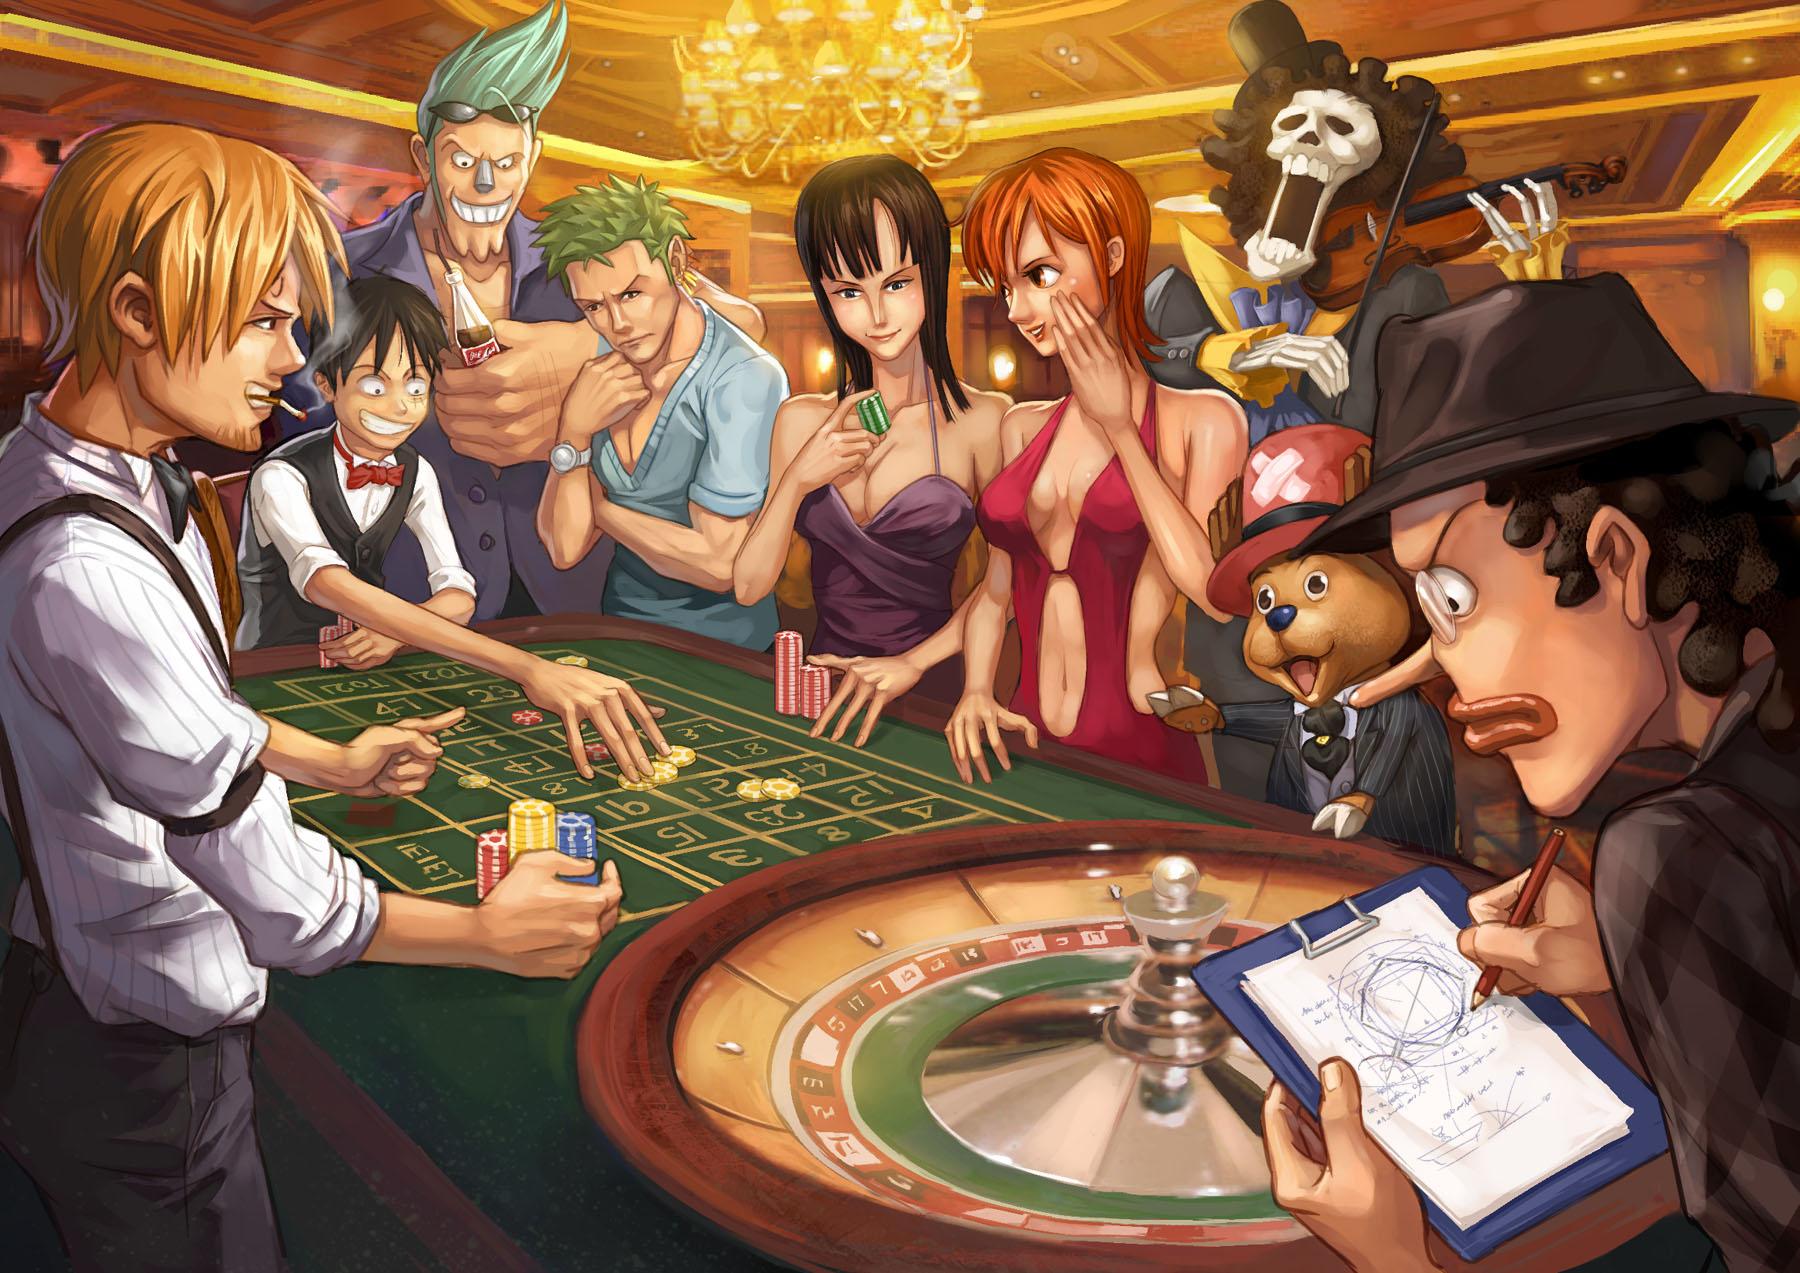 One Piece Wallpaper HD wallpaper ImageBankbiz 1800x1273